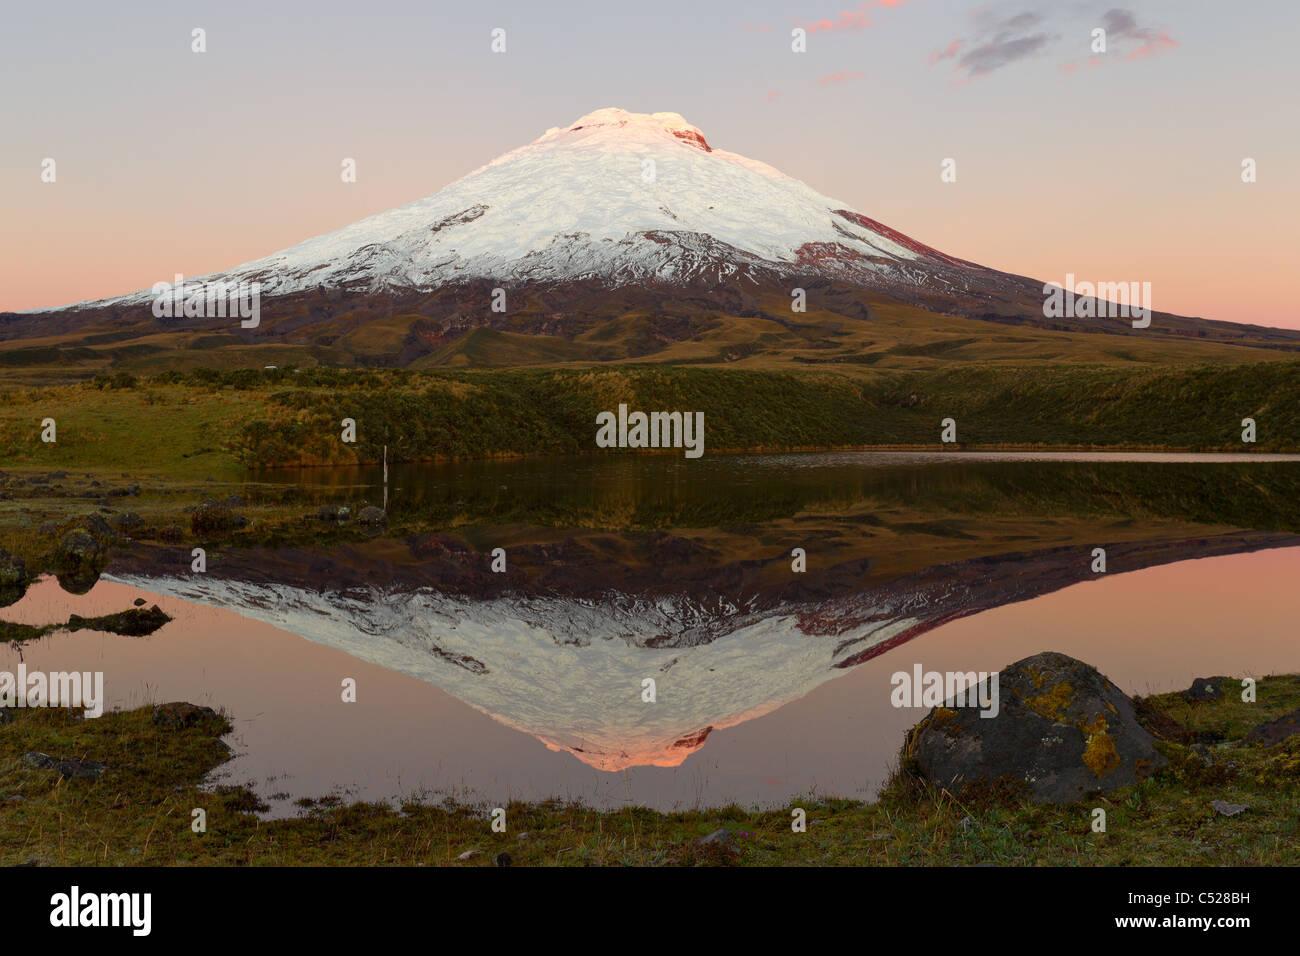 COTOPAXI VULKAN REFLEKTIEREN IN SANTO DOMINGO LAGUNE Stockbild